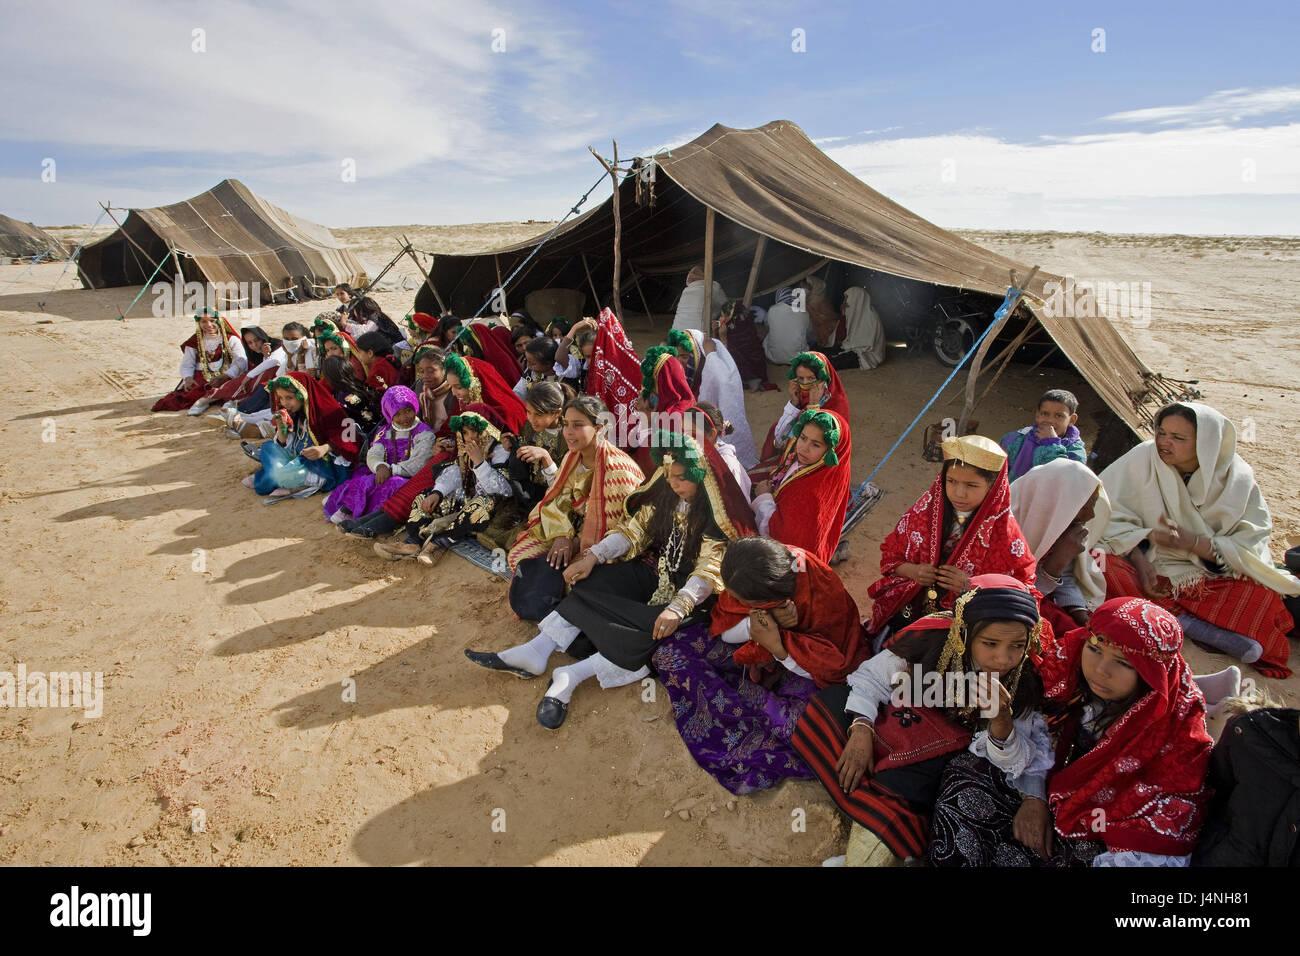 tunisia-douz-sahara-festival-berber-tents-north-africa-sahara-festival-J4NH81.jpg